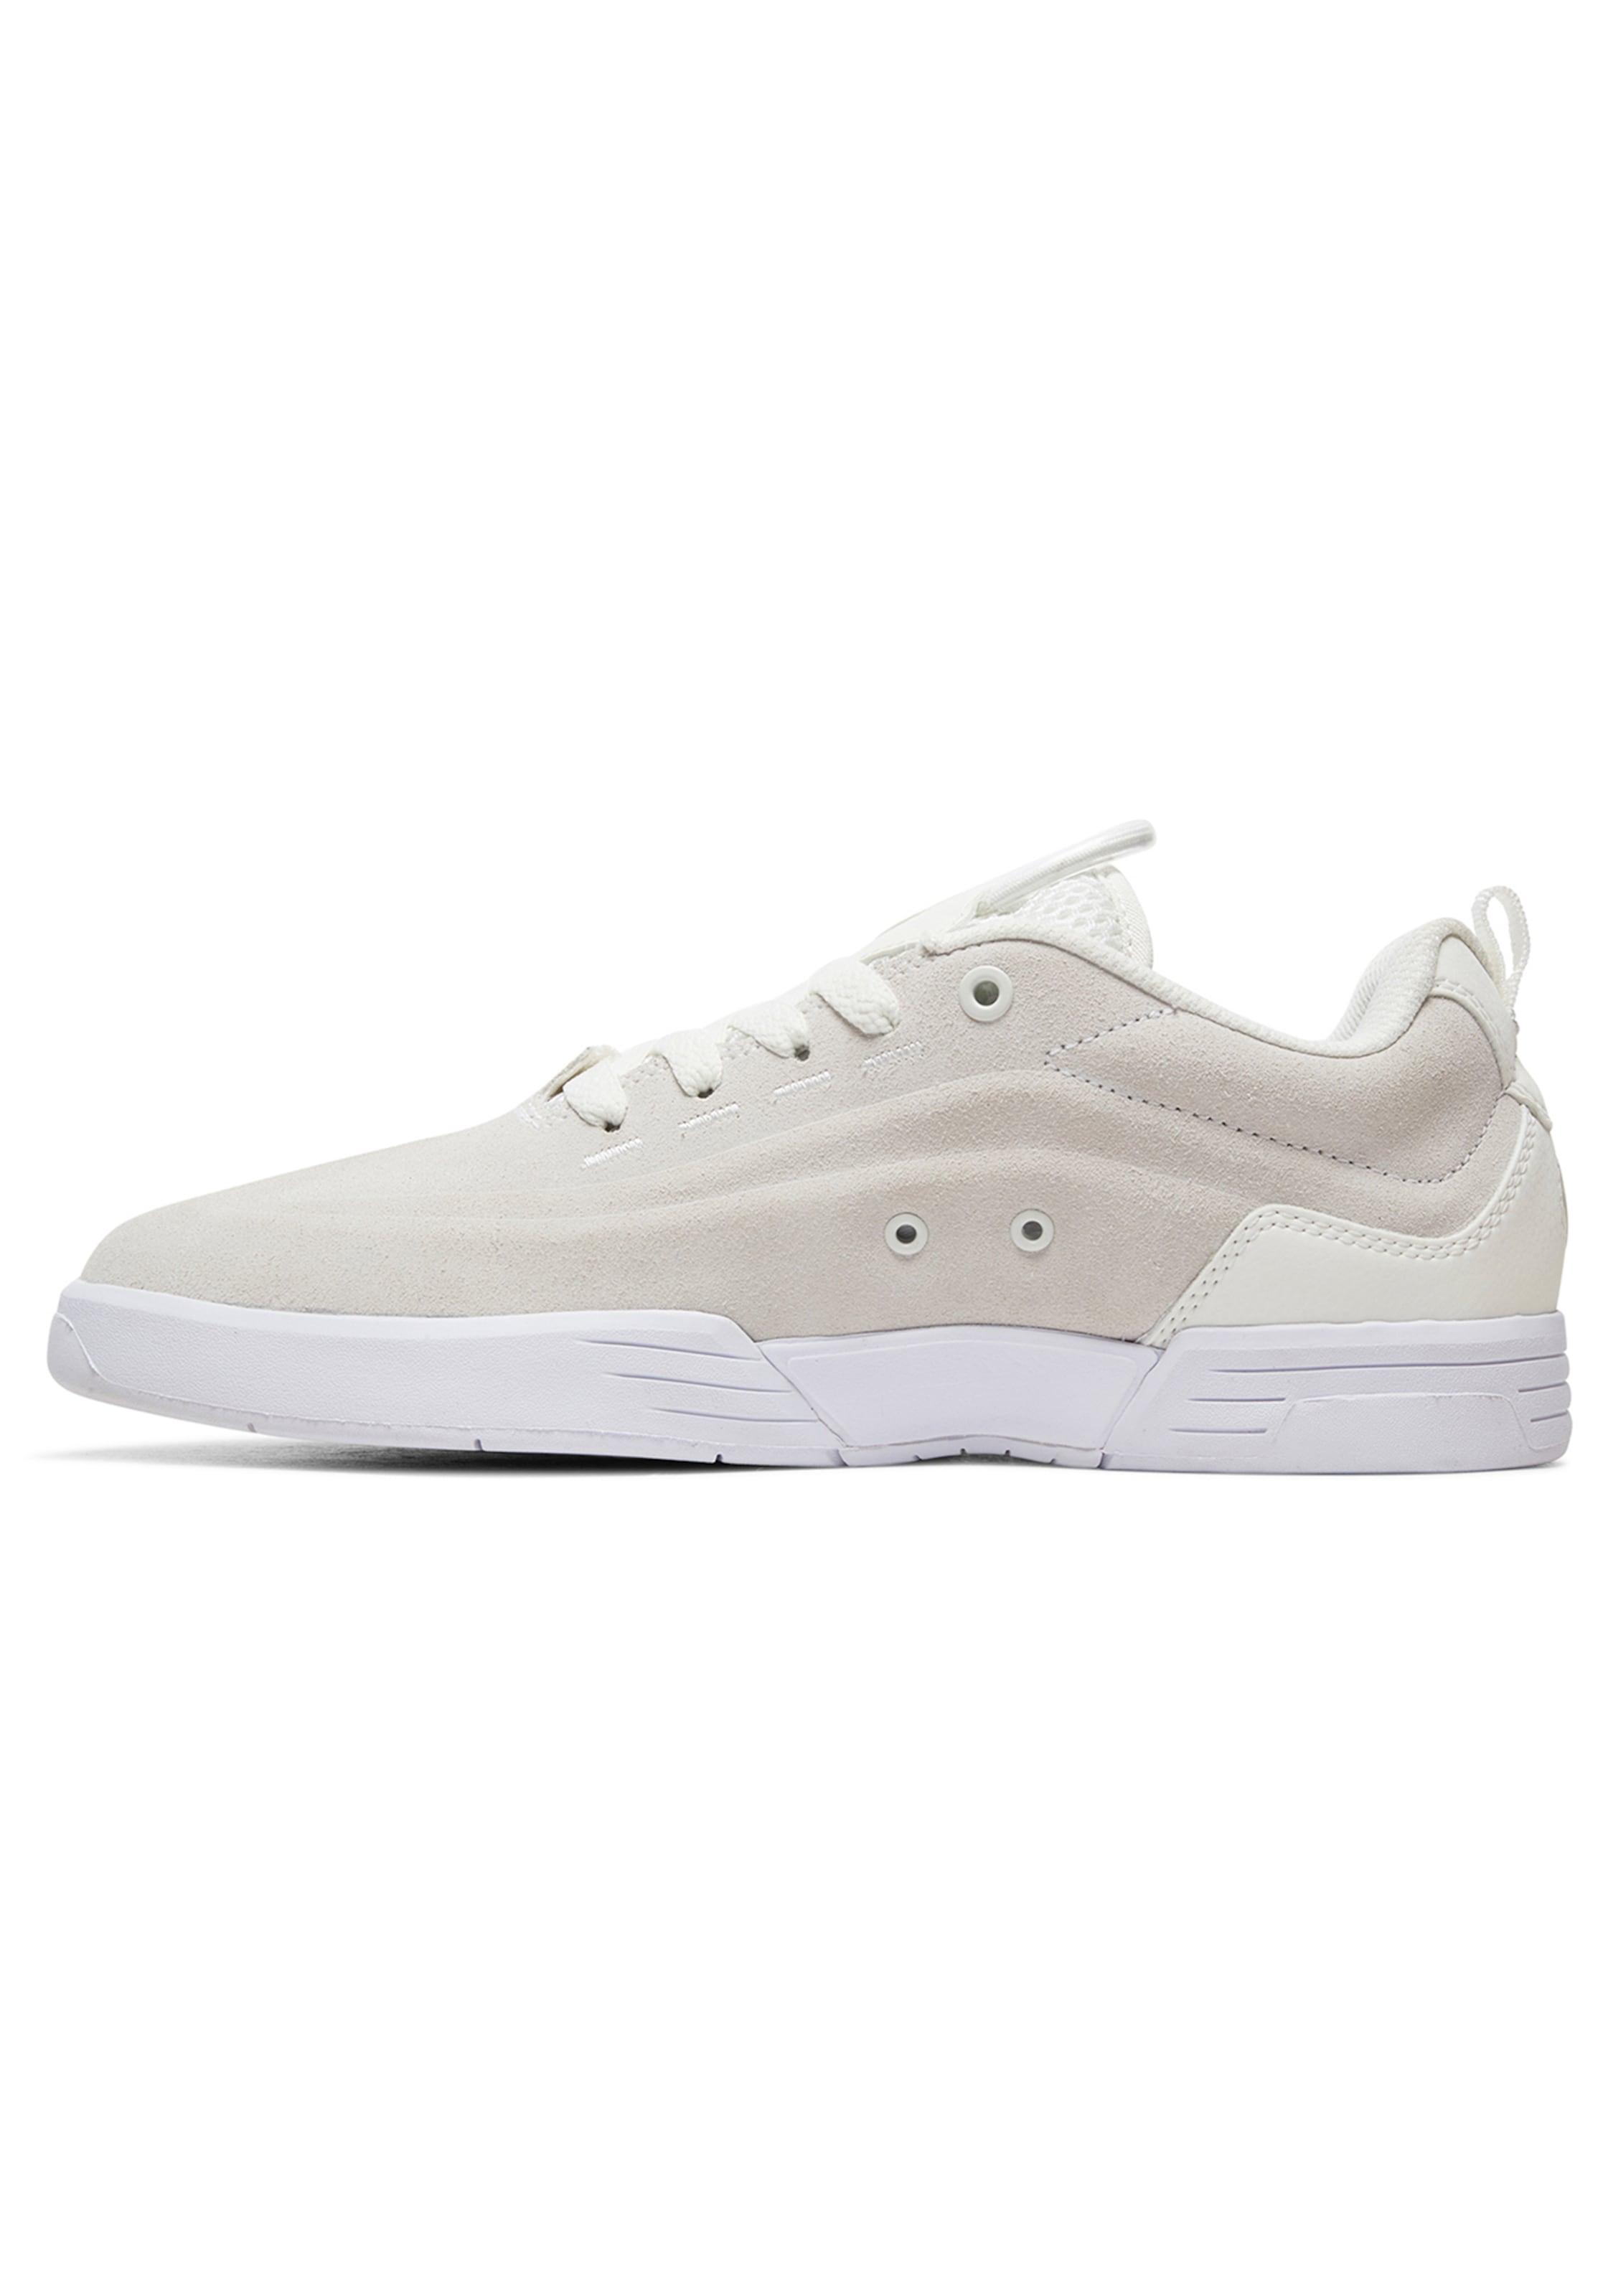 Shoes In Dc Perlweiß 98' Sneaker 'legacy N08nwvmO